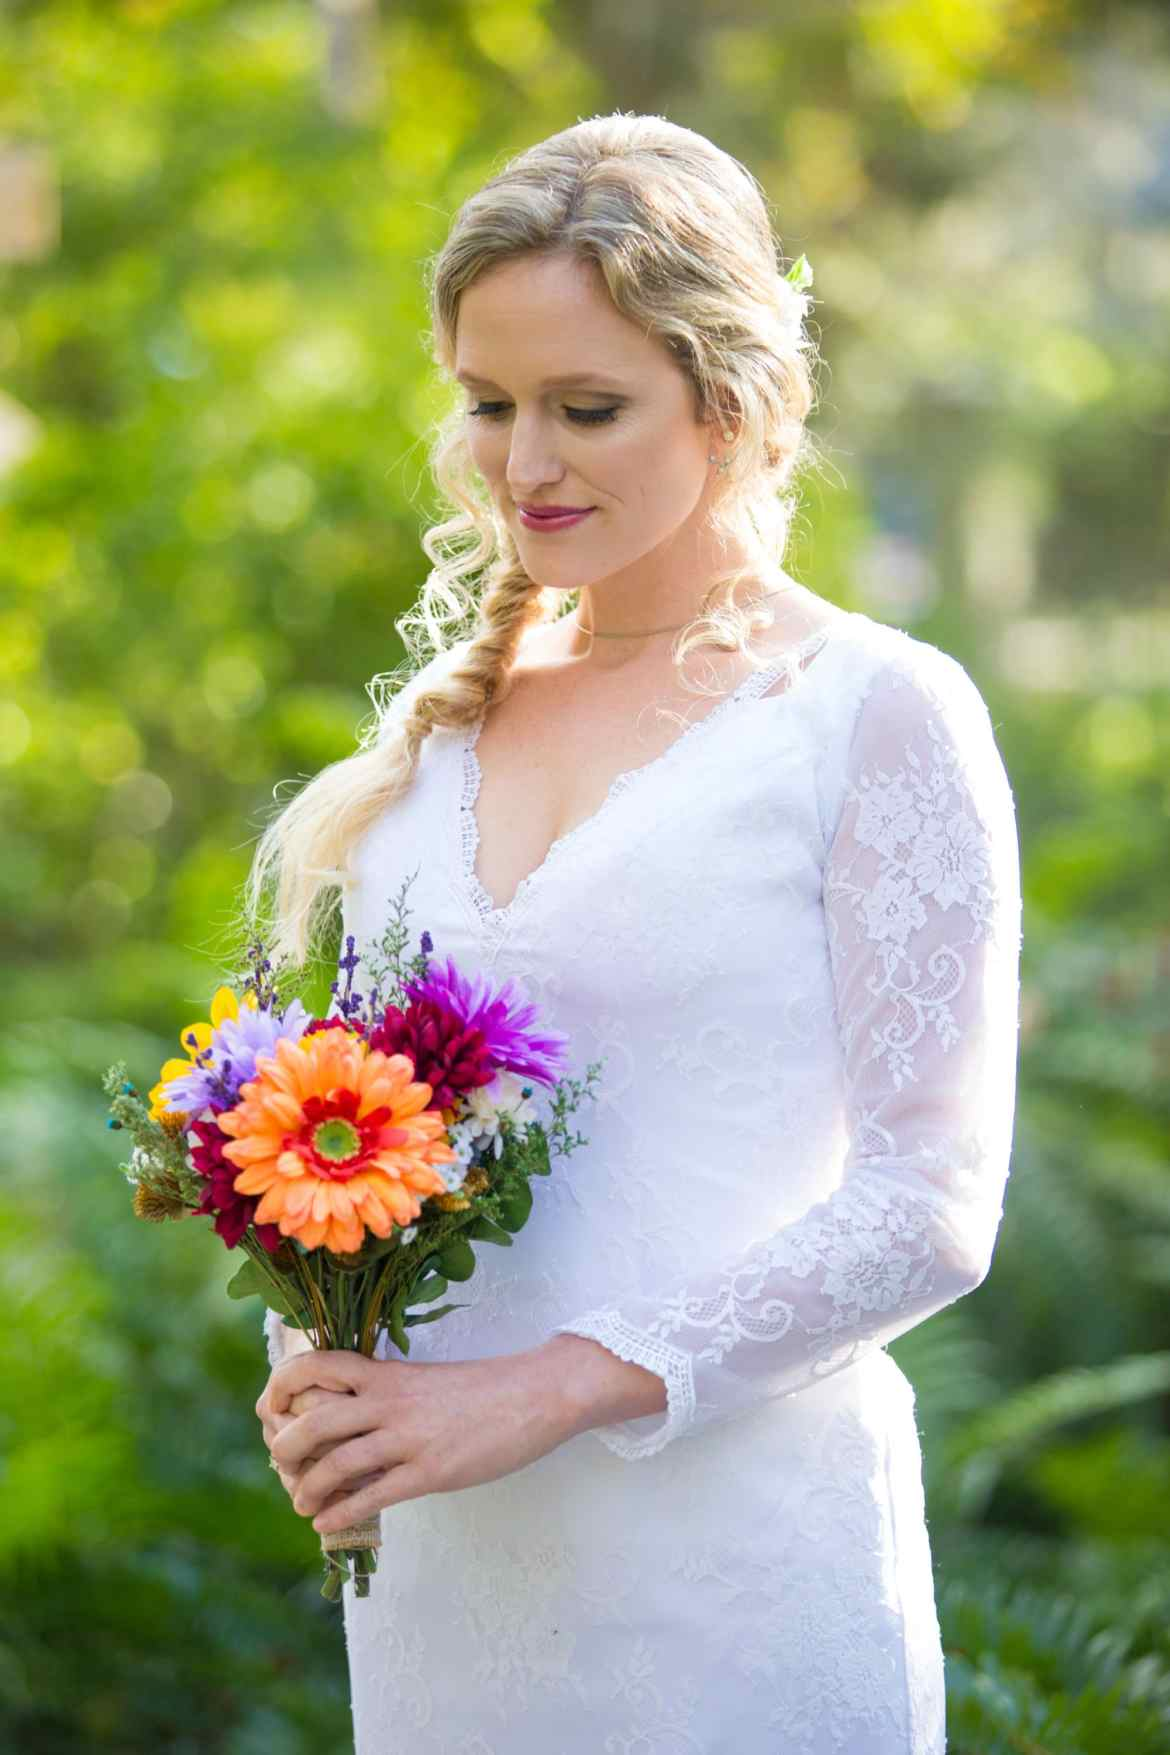 Port Orange Wedding photography image of bride before wedding at sugar Mill Gardens in port Orange, FL